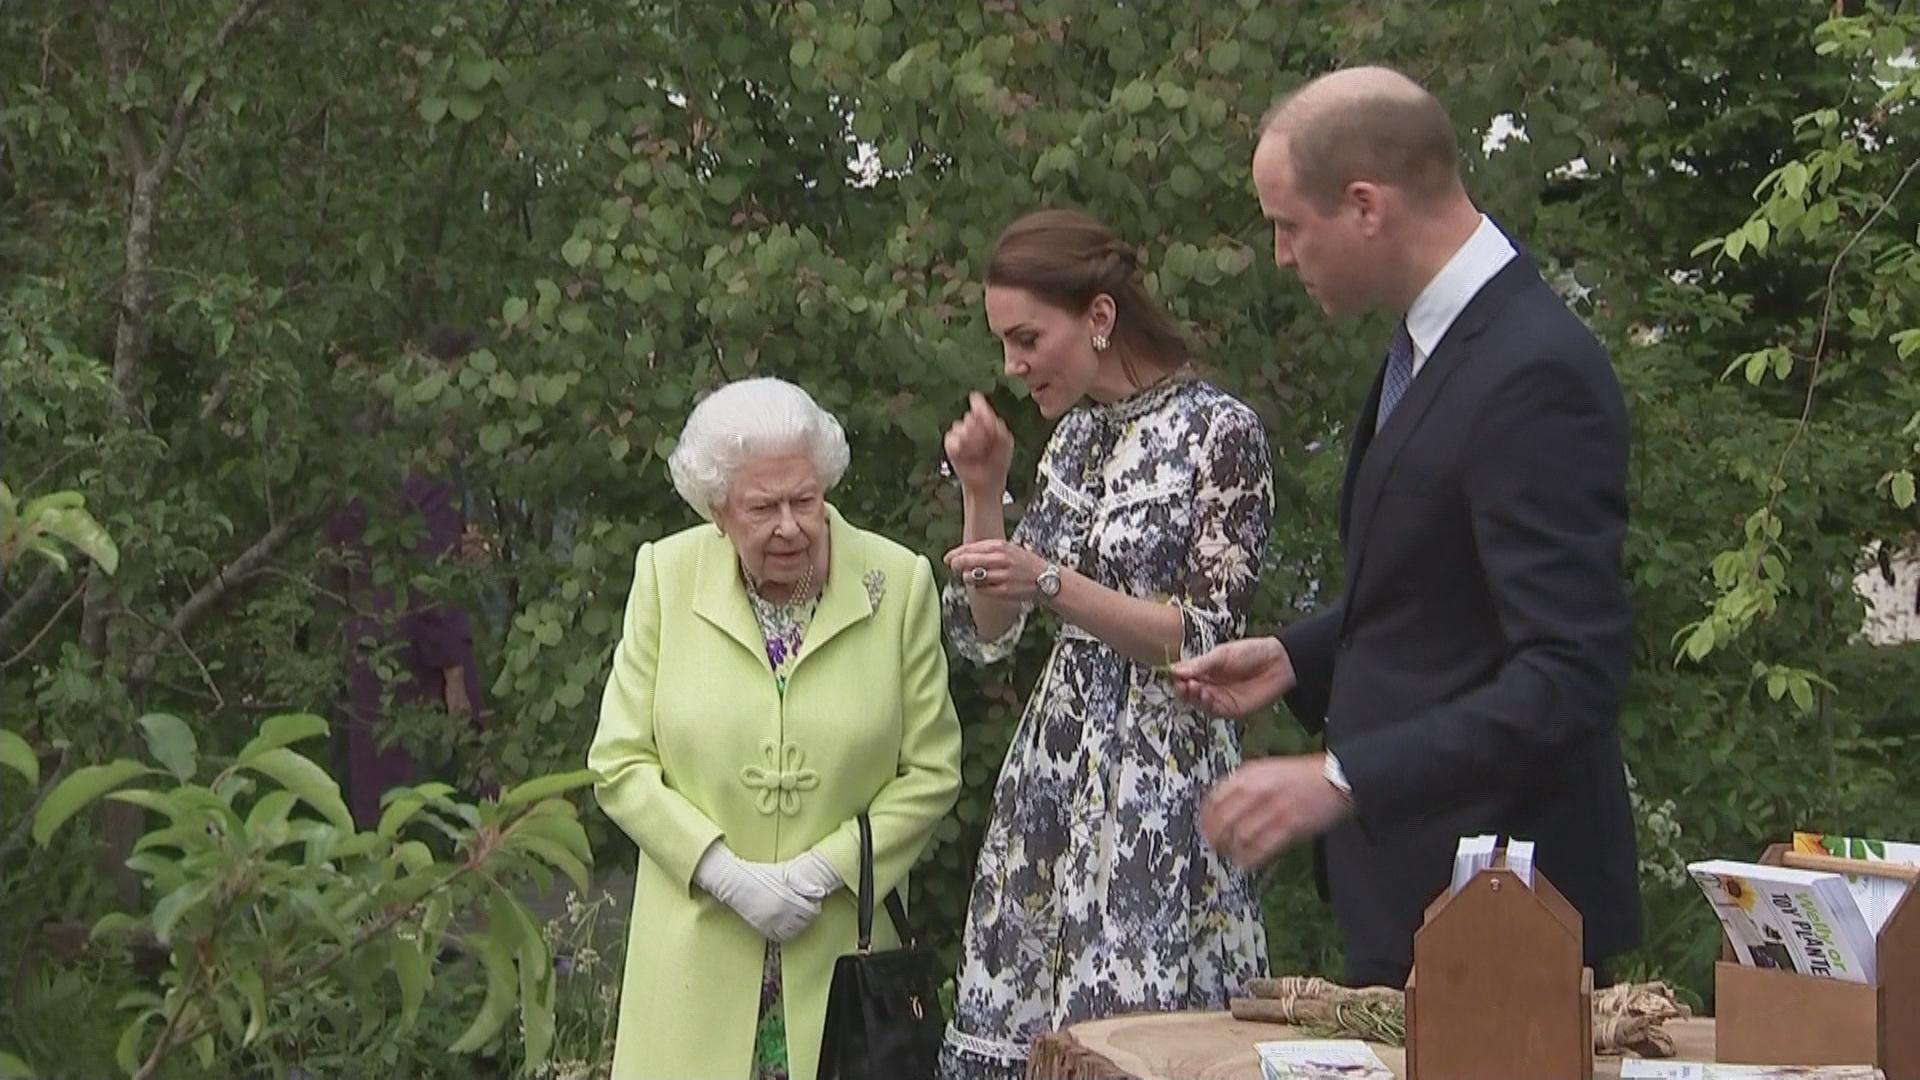 37 adorable photos to mark Prince William's 37th birthday